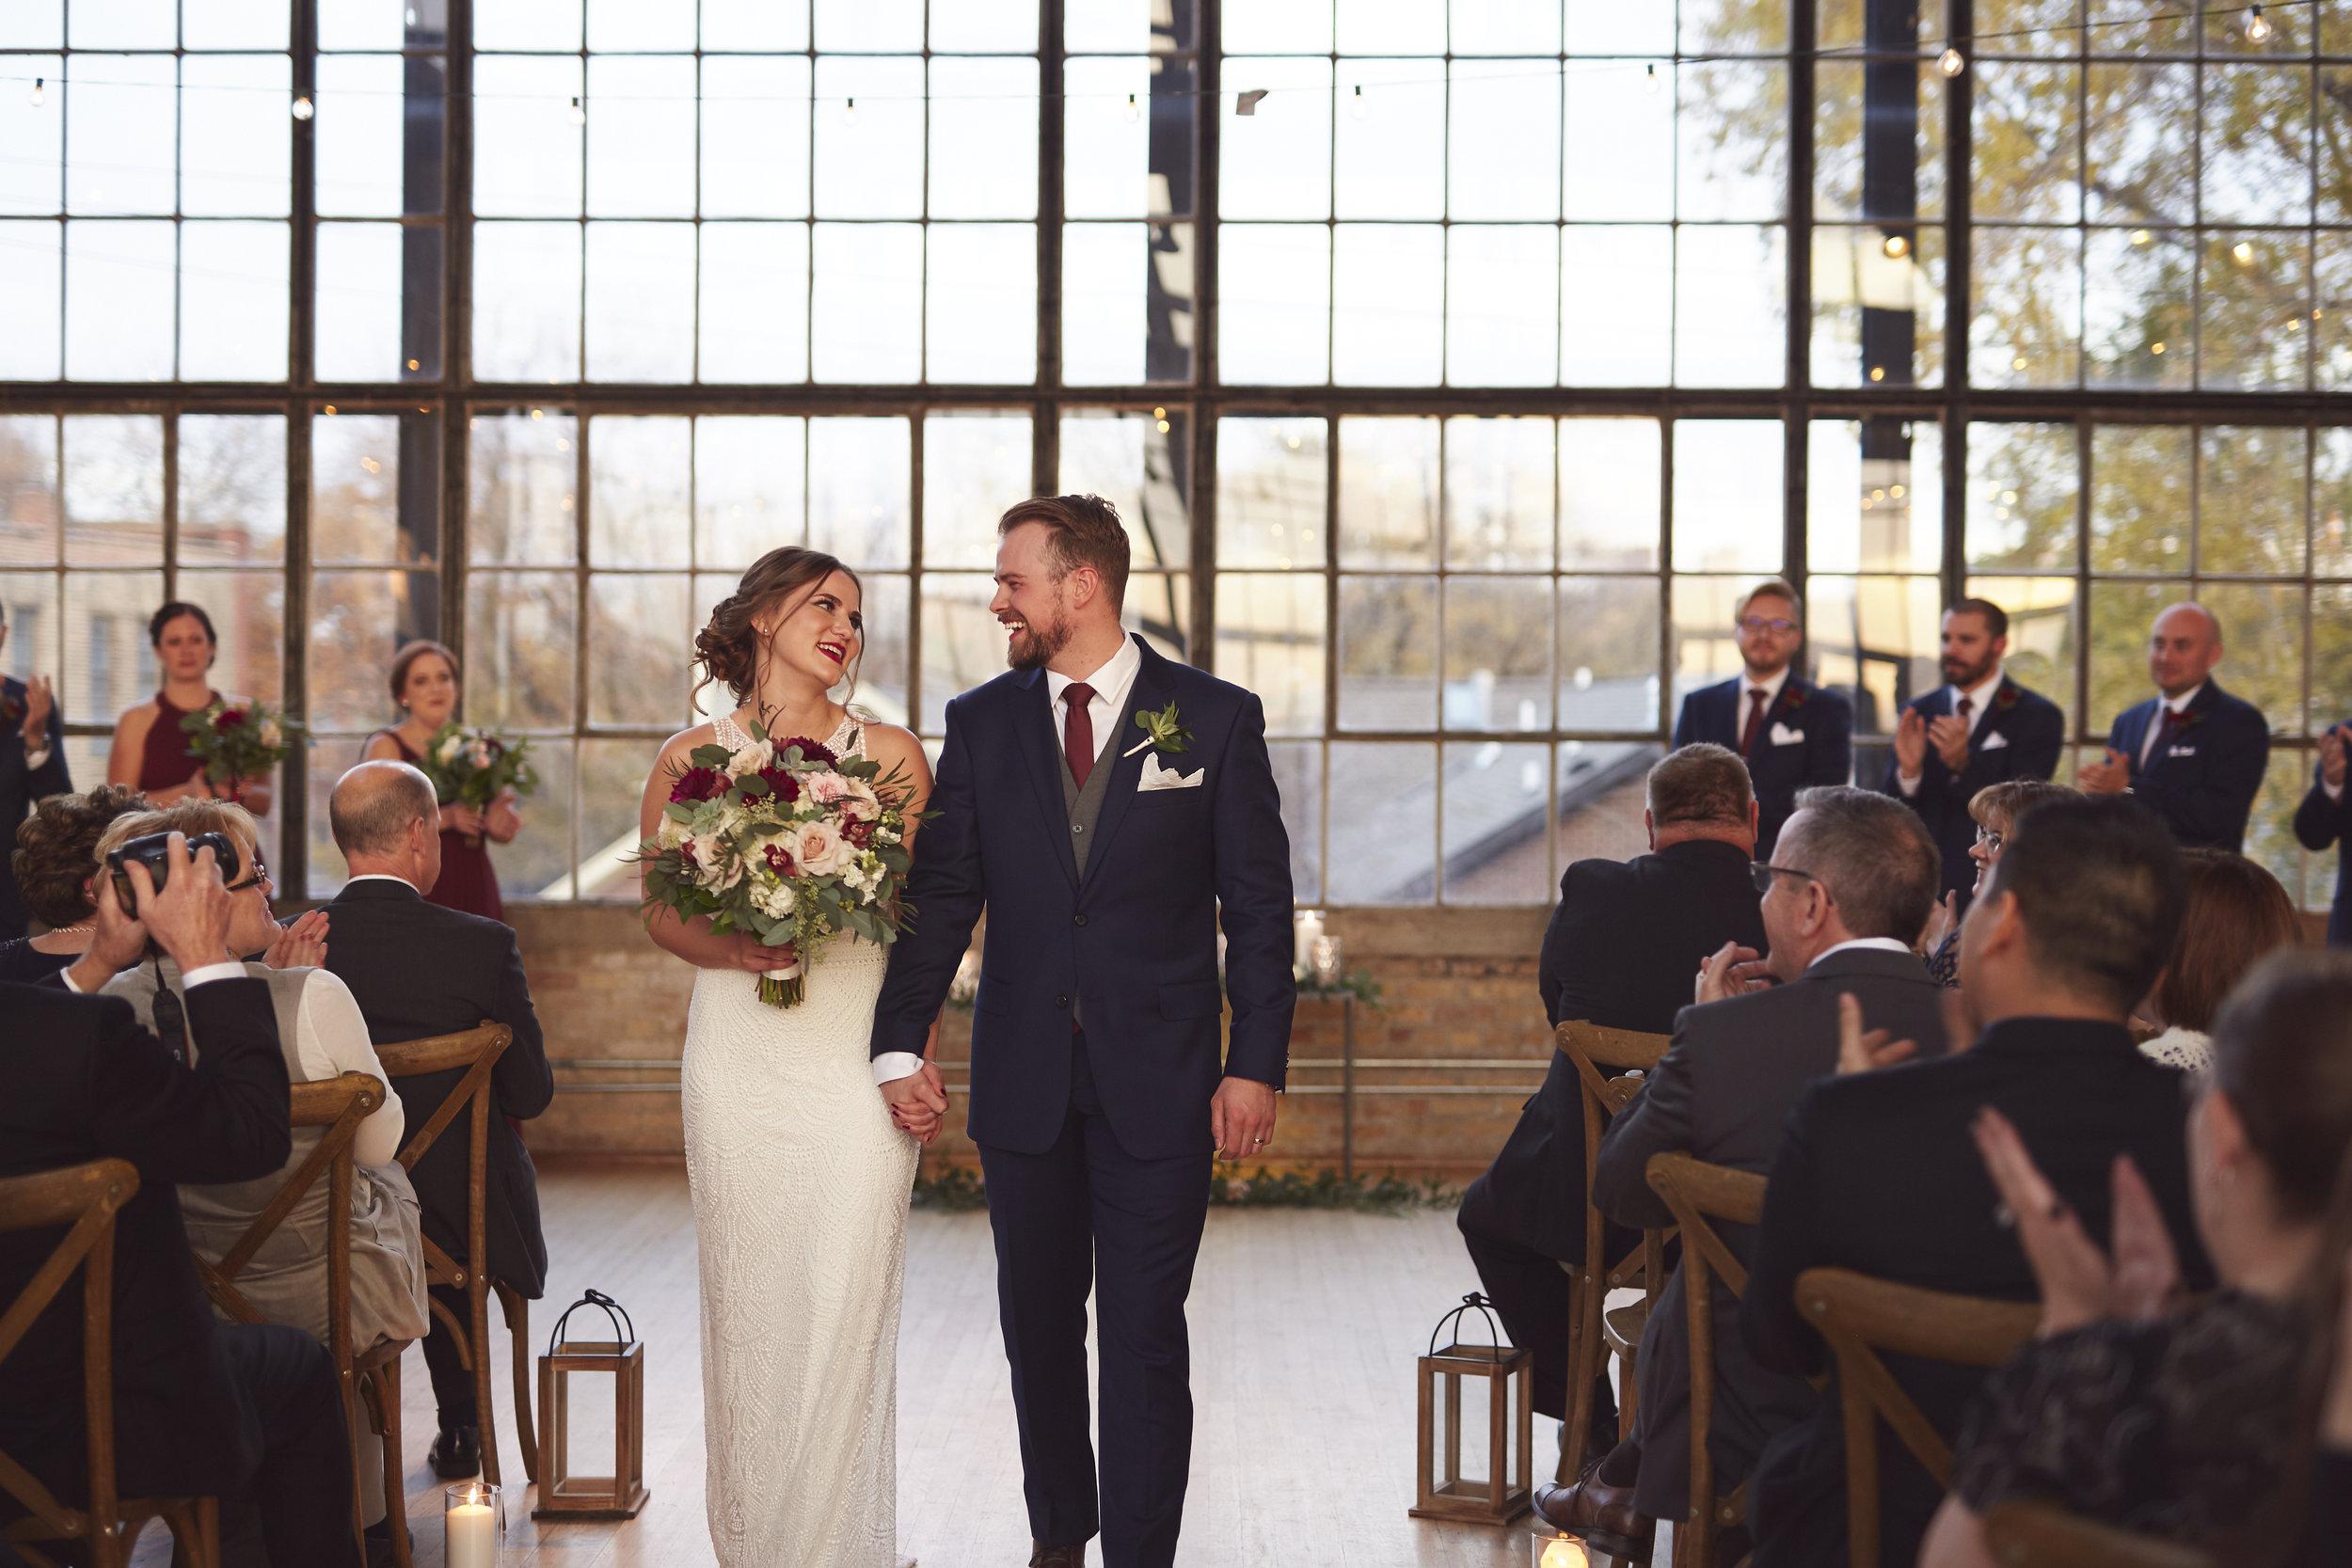 Jen & Ben Wedding - benromangphoto - 6I5A3711.jpg